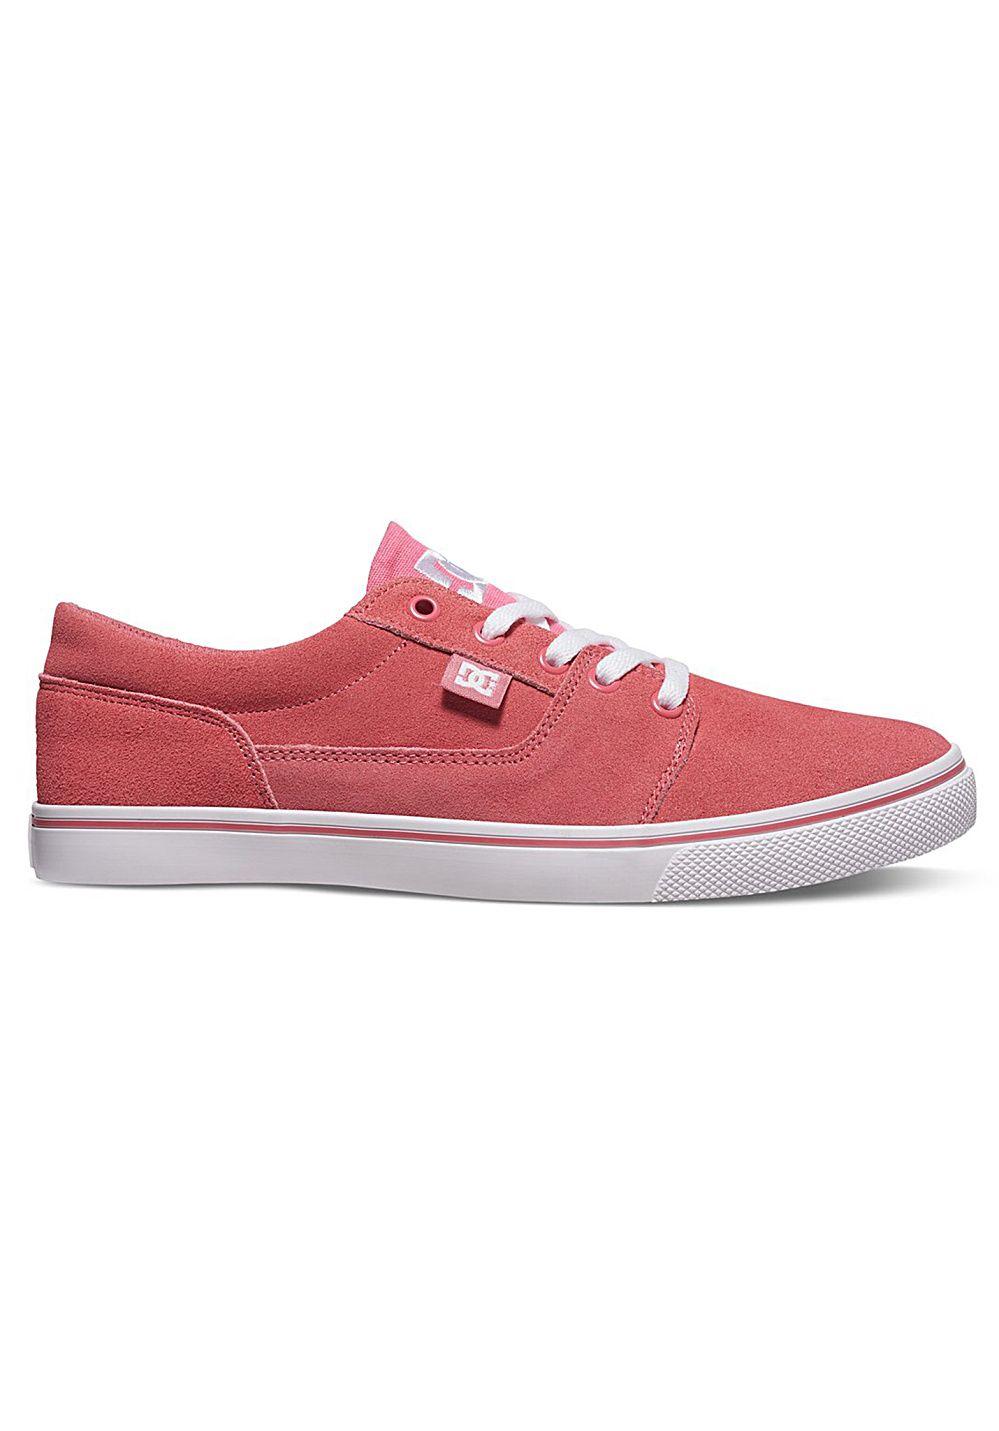 DC Tonik WE SE Sneakers for Women Pink